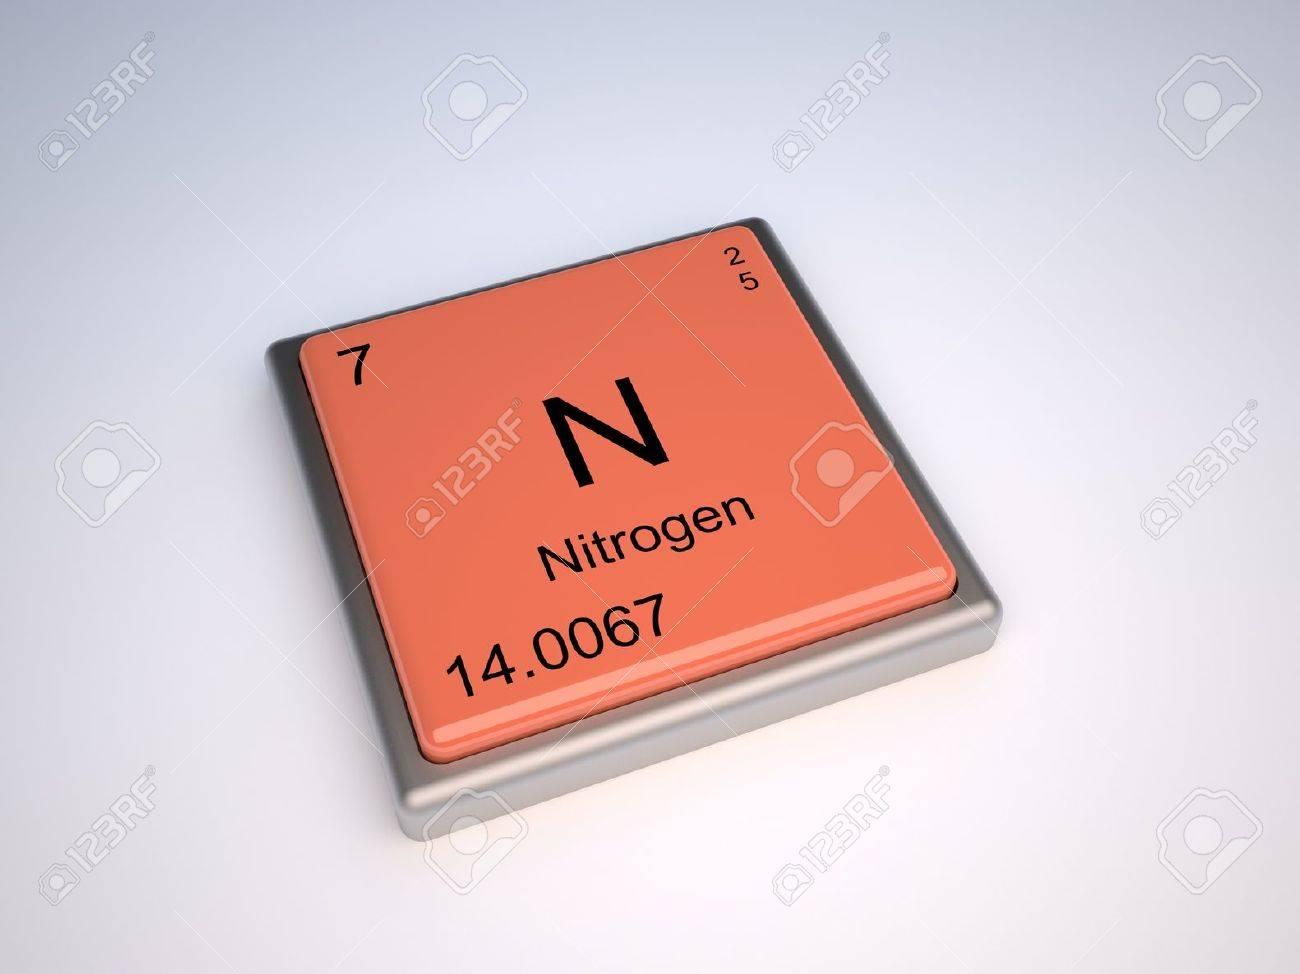 Elemento qumico de nitrgeno de la tabla peridica con smbolo n elemento qumico de nitrgeno de la tabla peridica con smbolo n iupac foto de archivo urtaz Choice Image